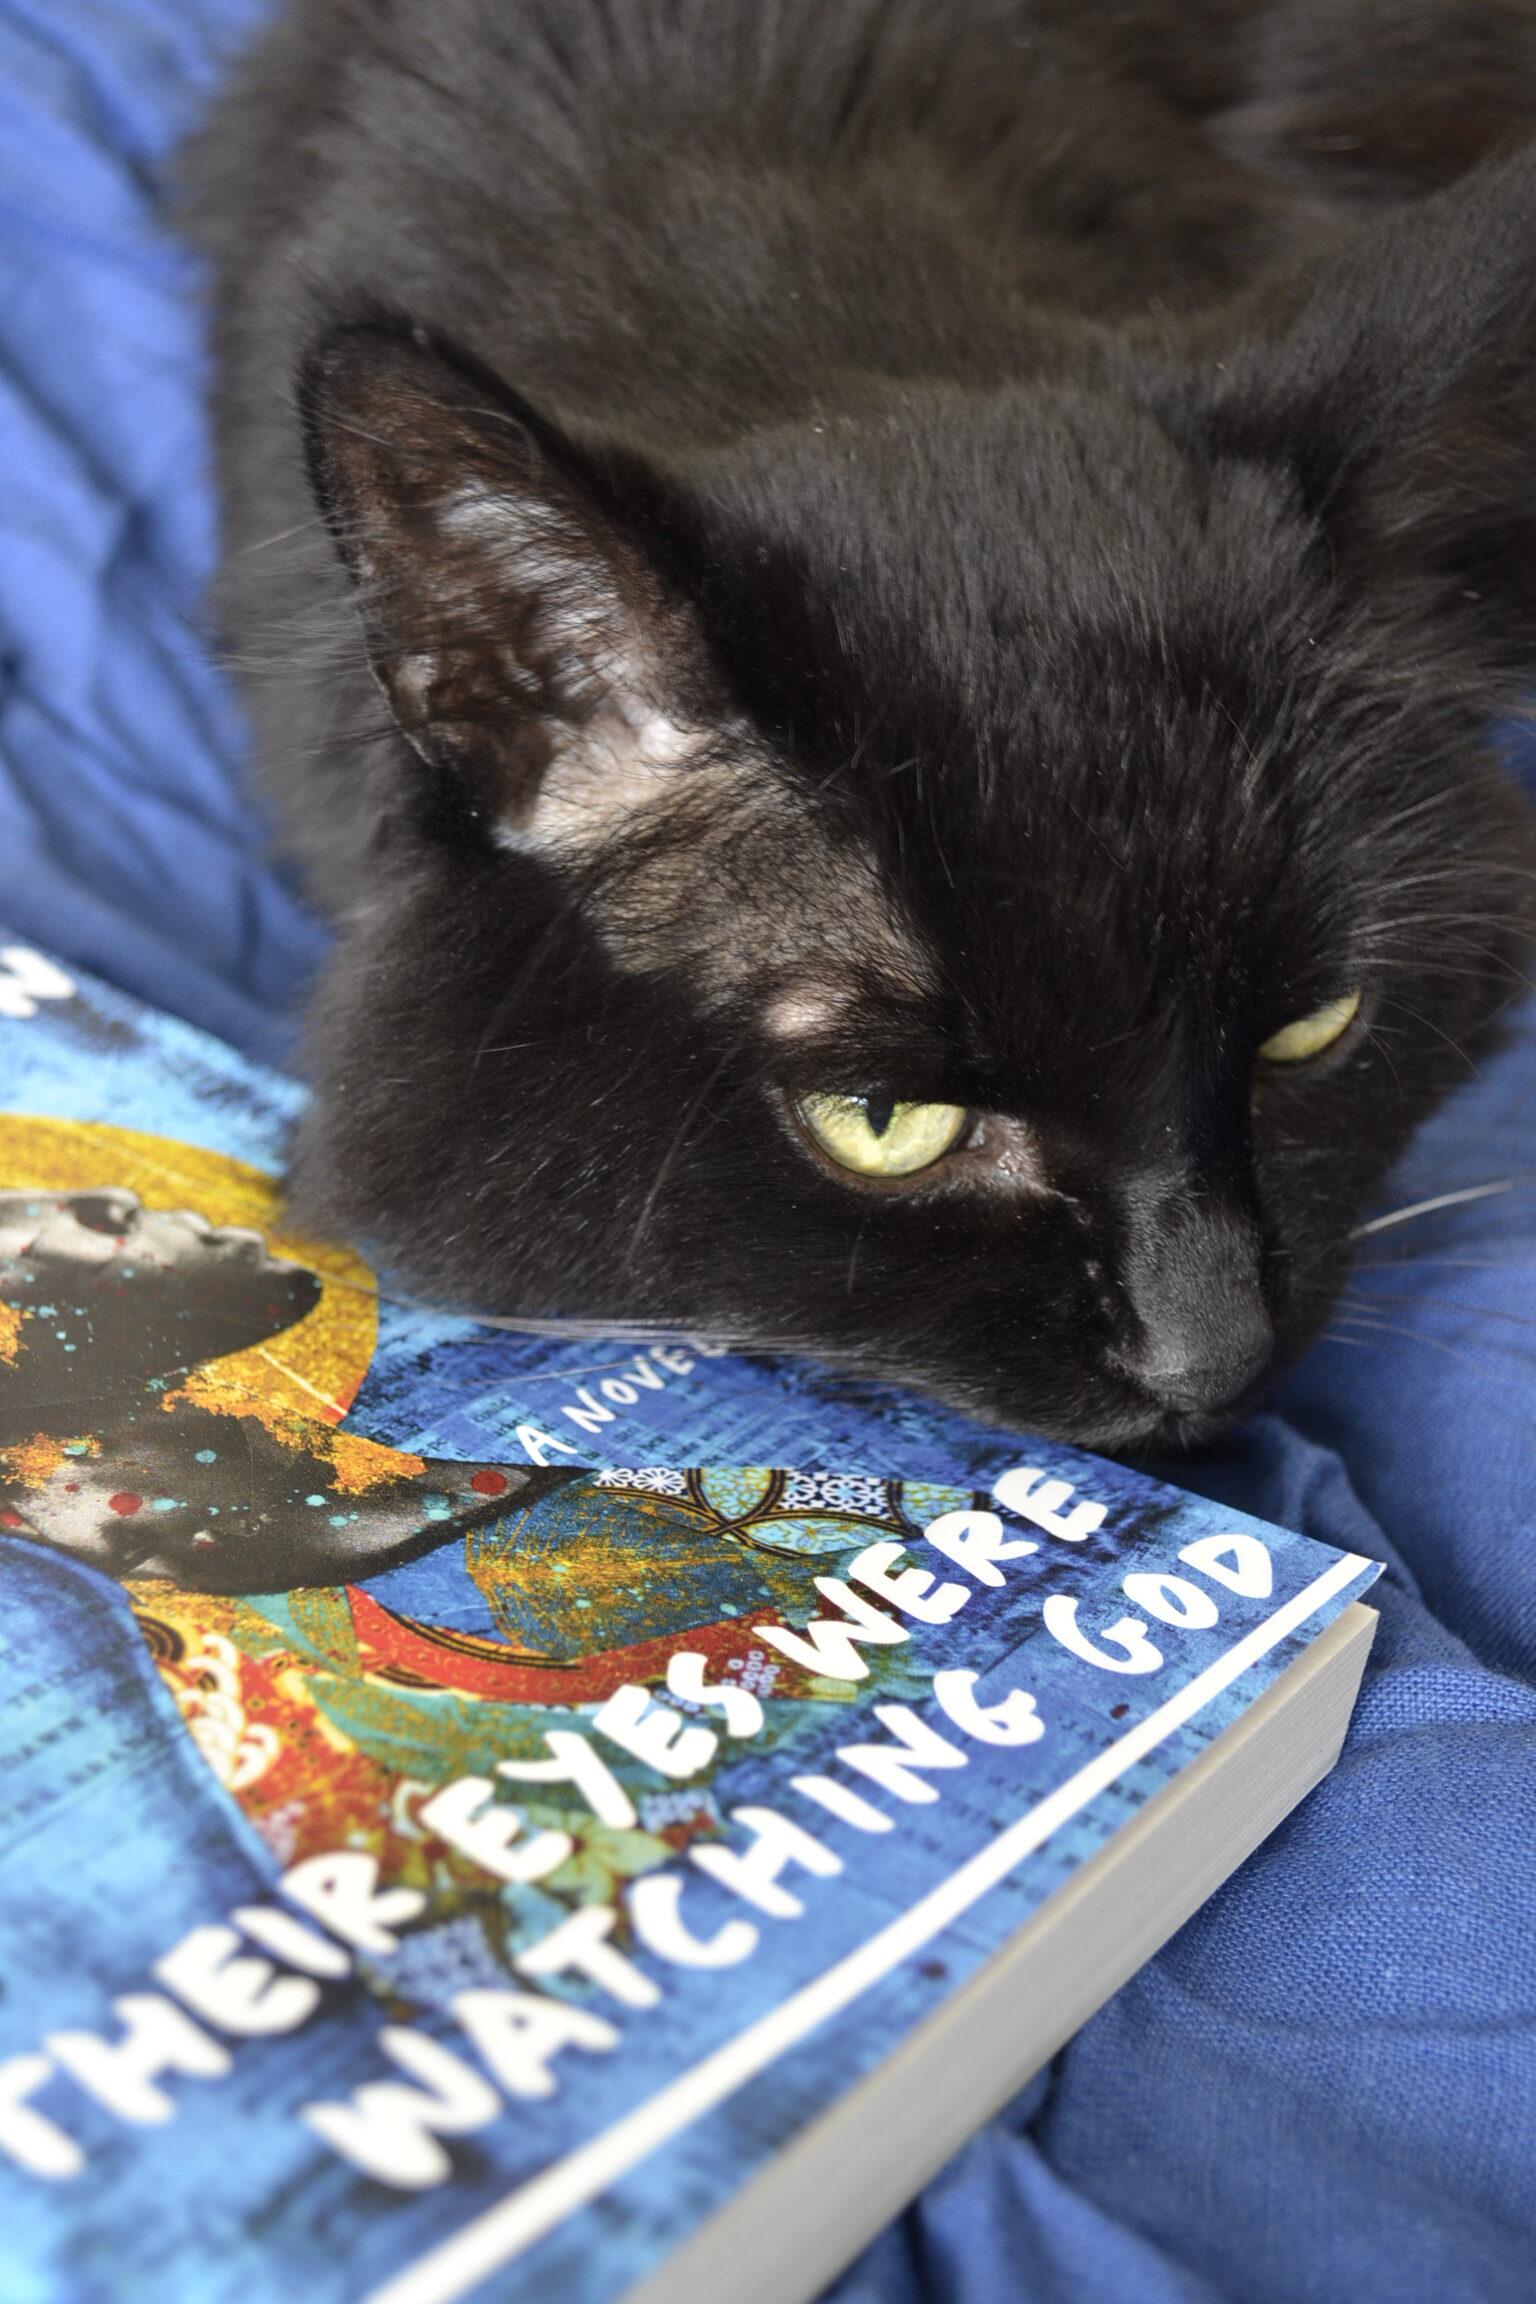 A black cat rubs a bright blue copy of Their Eyes Were Watching God.